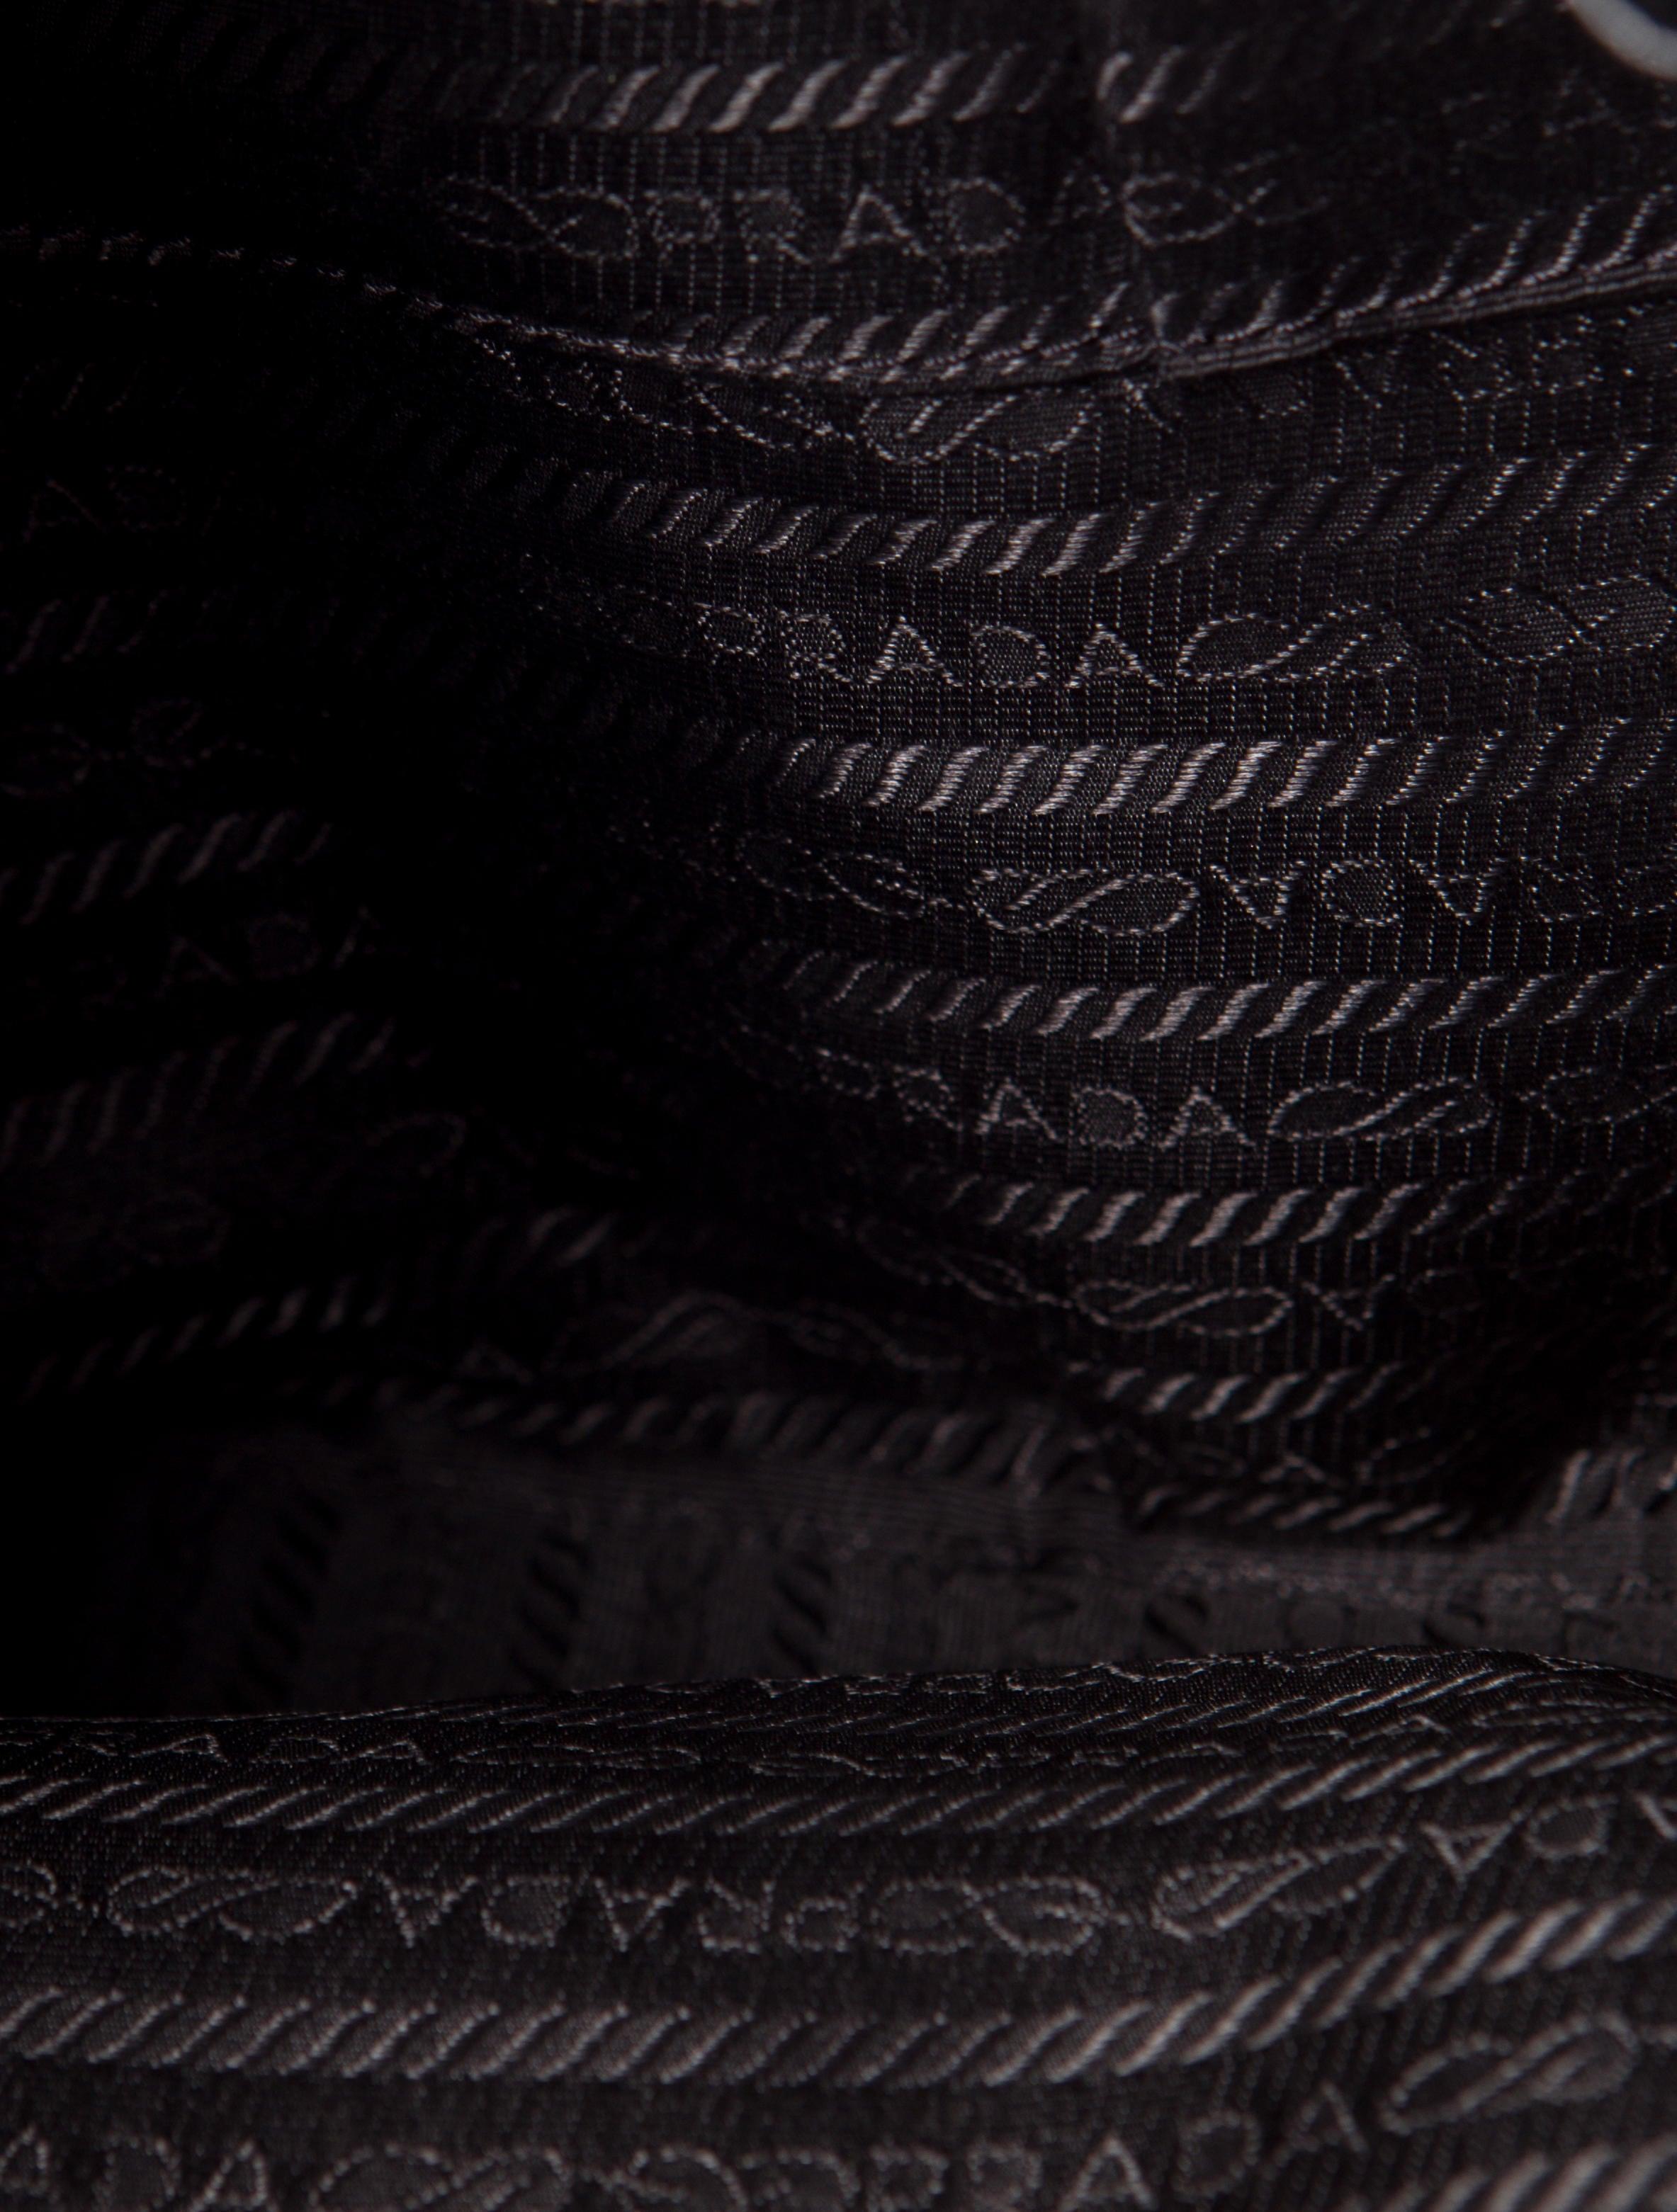 prada purple bag - Prada Vitello Daino Chain Bag - Handbags - PRA56792 | The RealReal